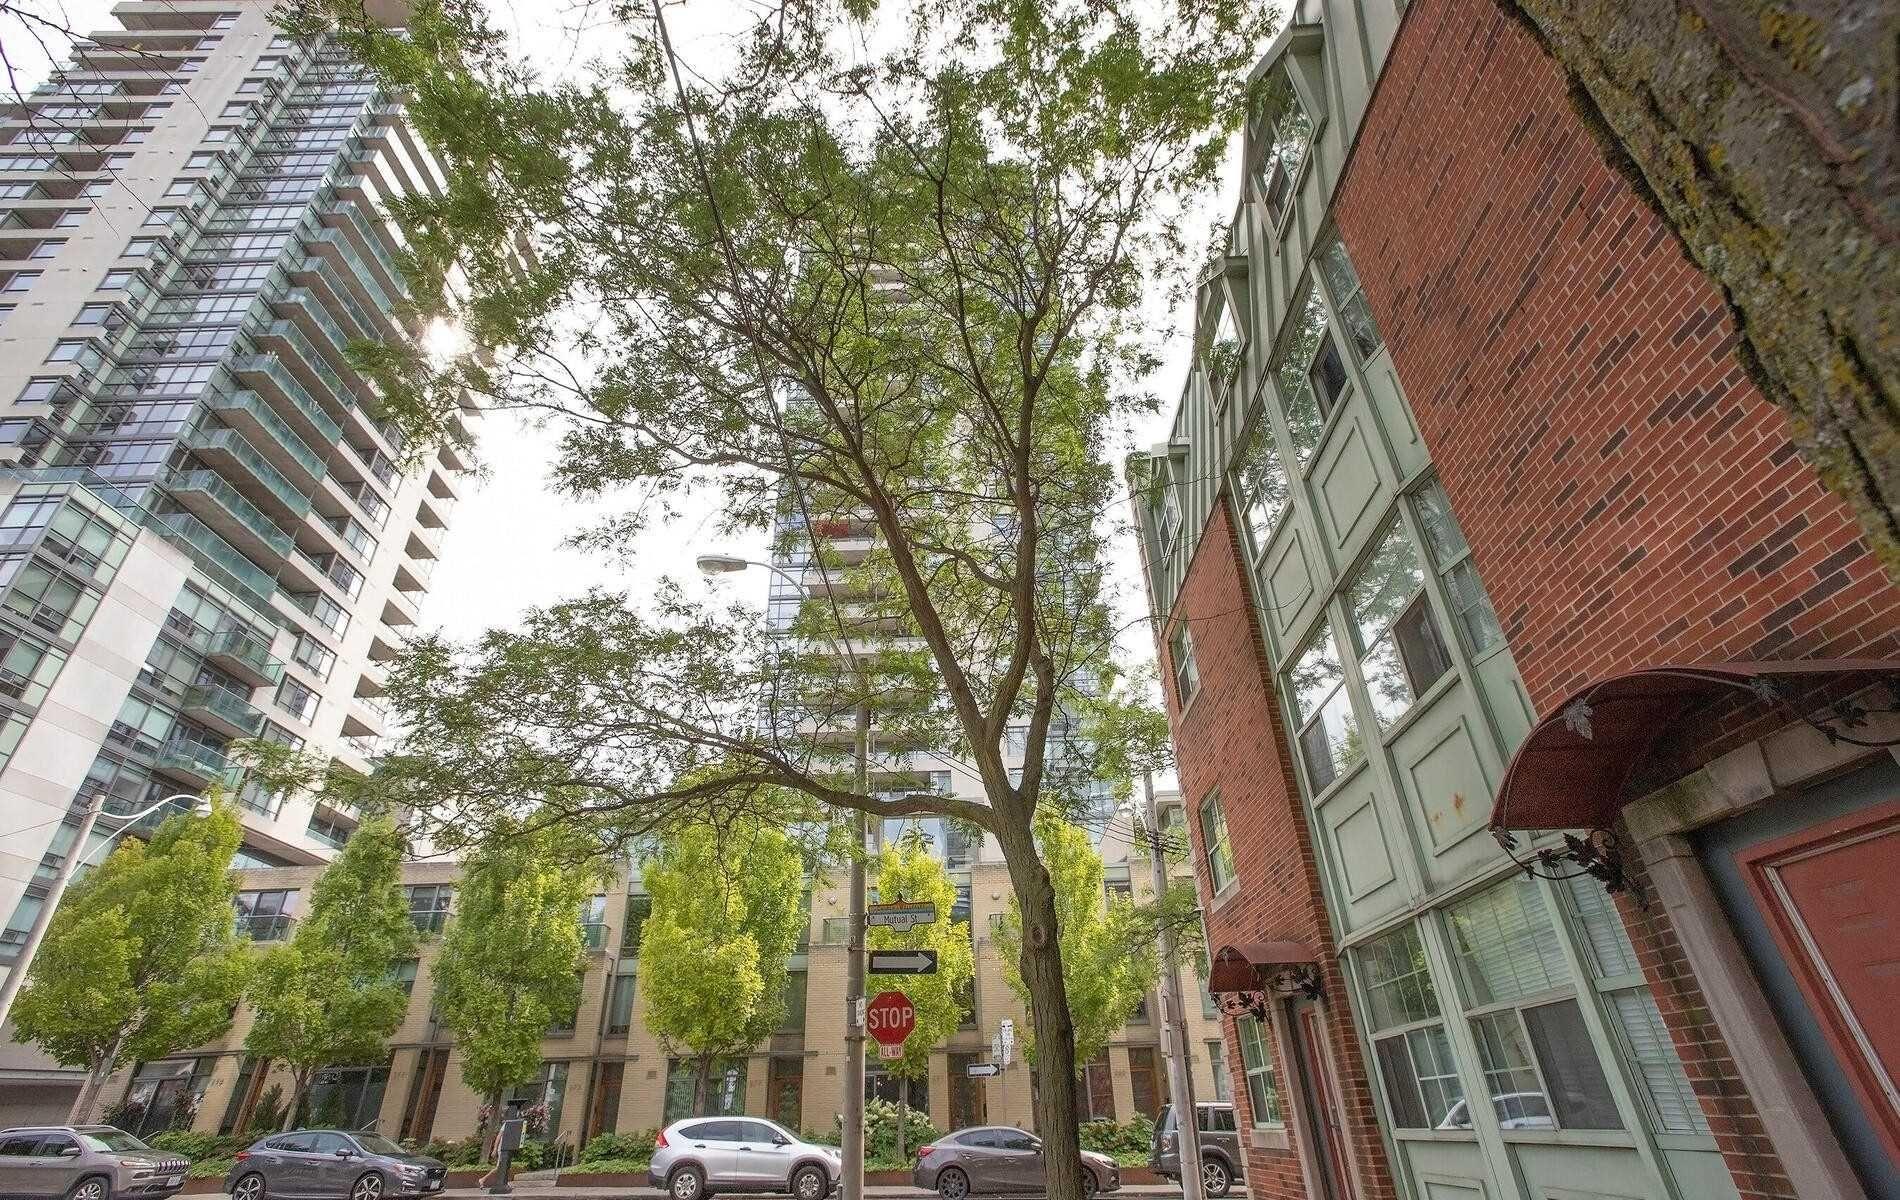 Main Photo: 304 281 Mutual Street in Toronto: Church-Yonge Corridor Condo for sale (Toronto C08)  : MLS®# C5338581